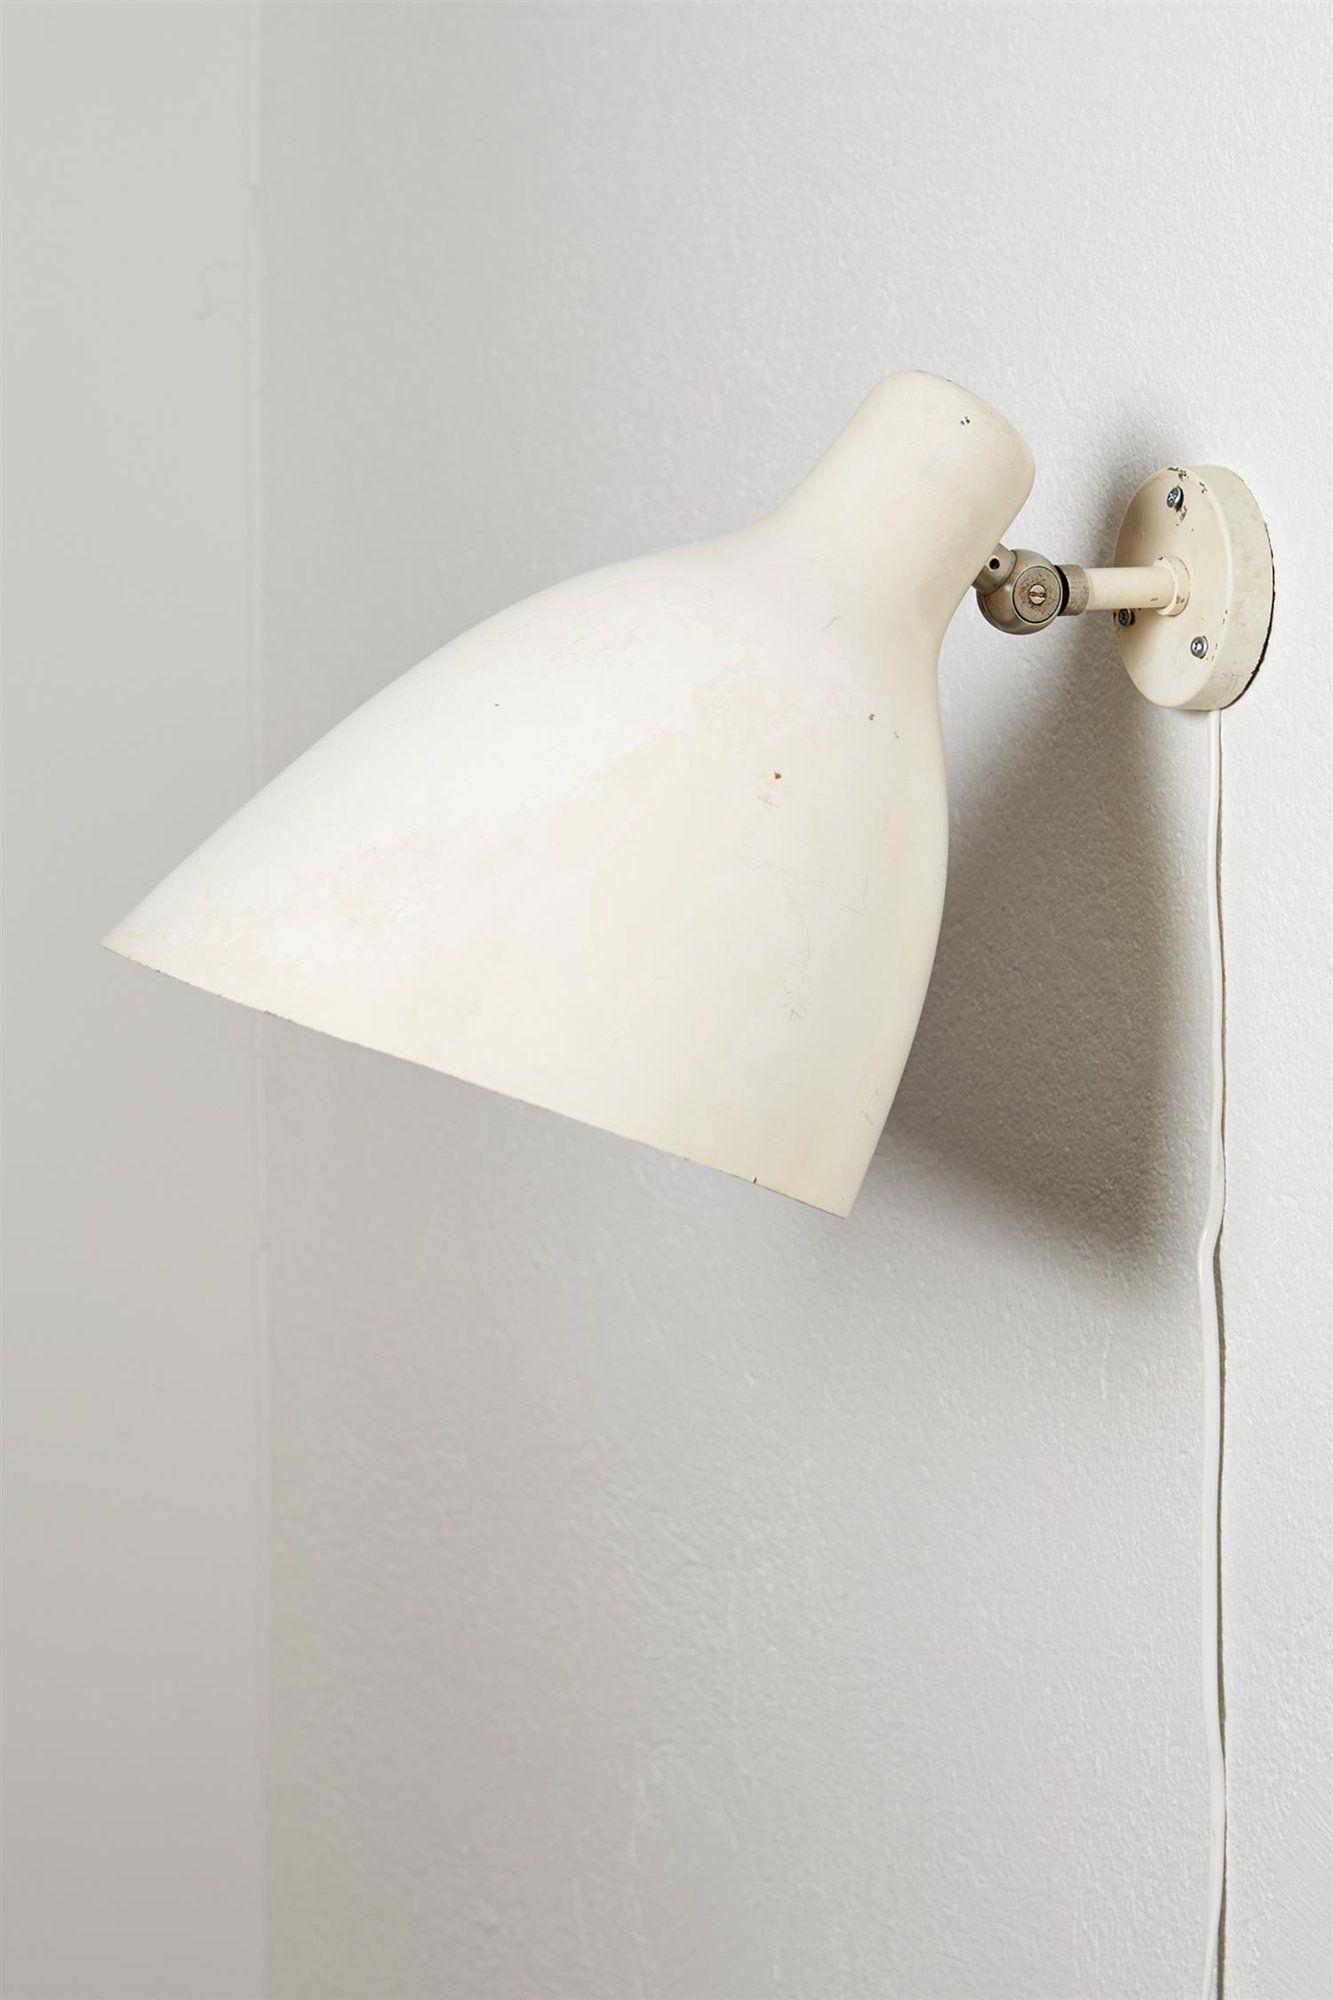 Erik Gunnar Asplund; Enameled Steel Wall Light from the Gothenburg Law Courts, 1930s.